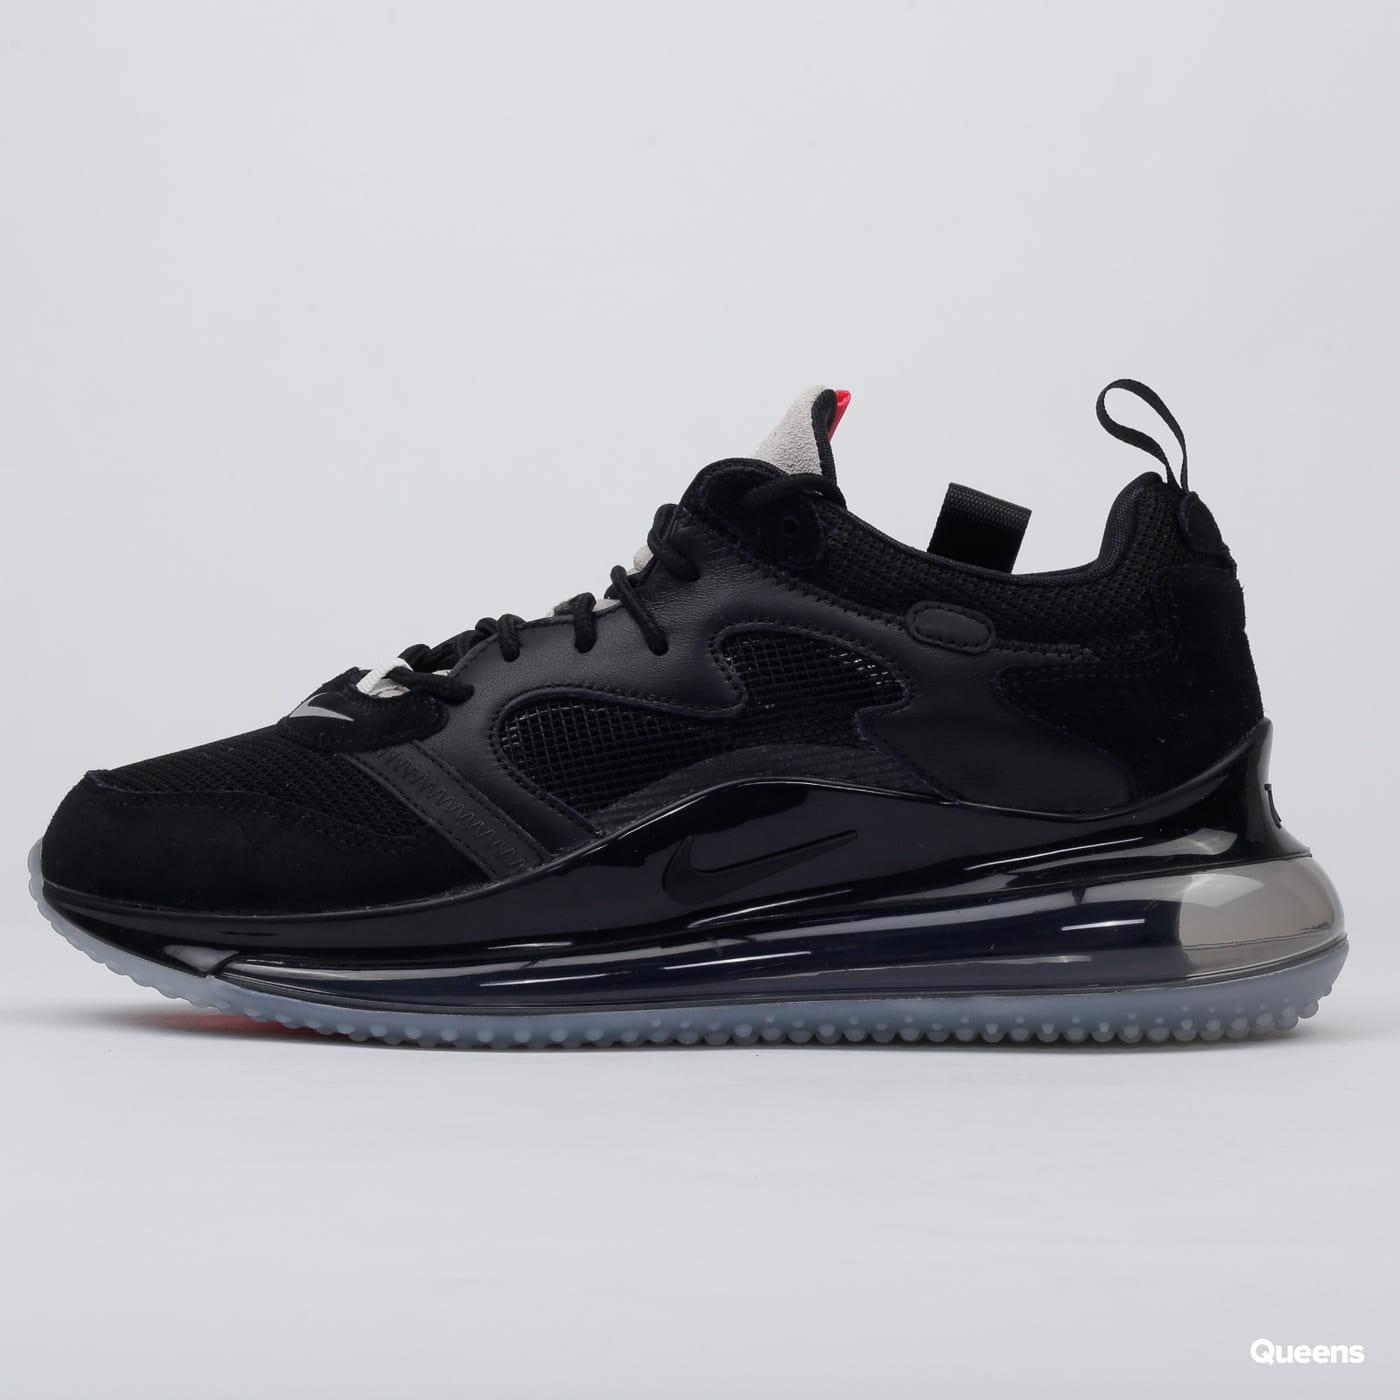 Nike Air Max 720 / OBJ black / summit white - red orbit